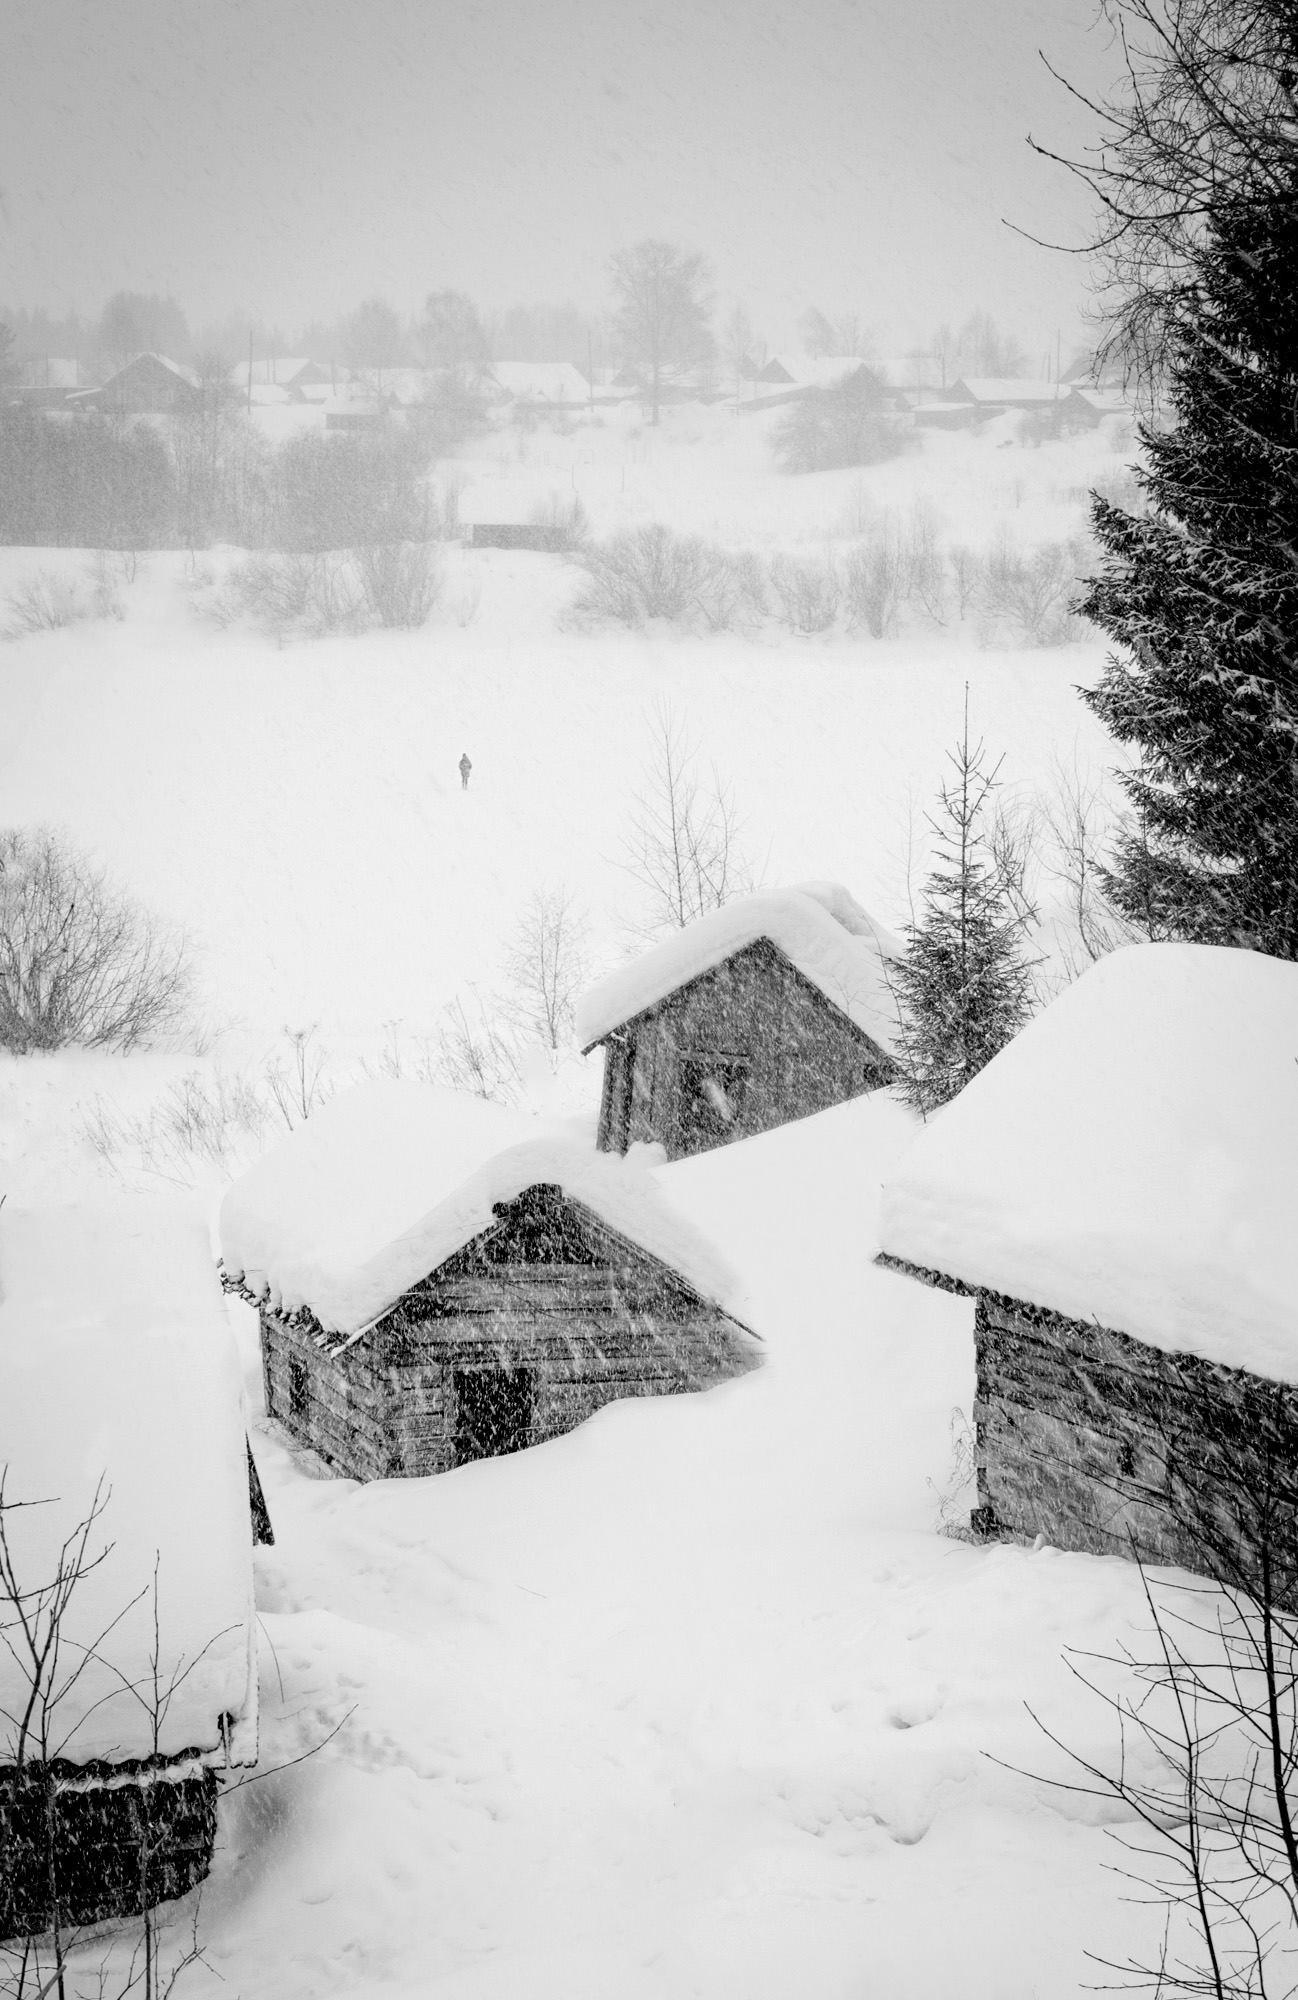 Изоставени къщи в с. Шелоховская